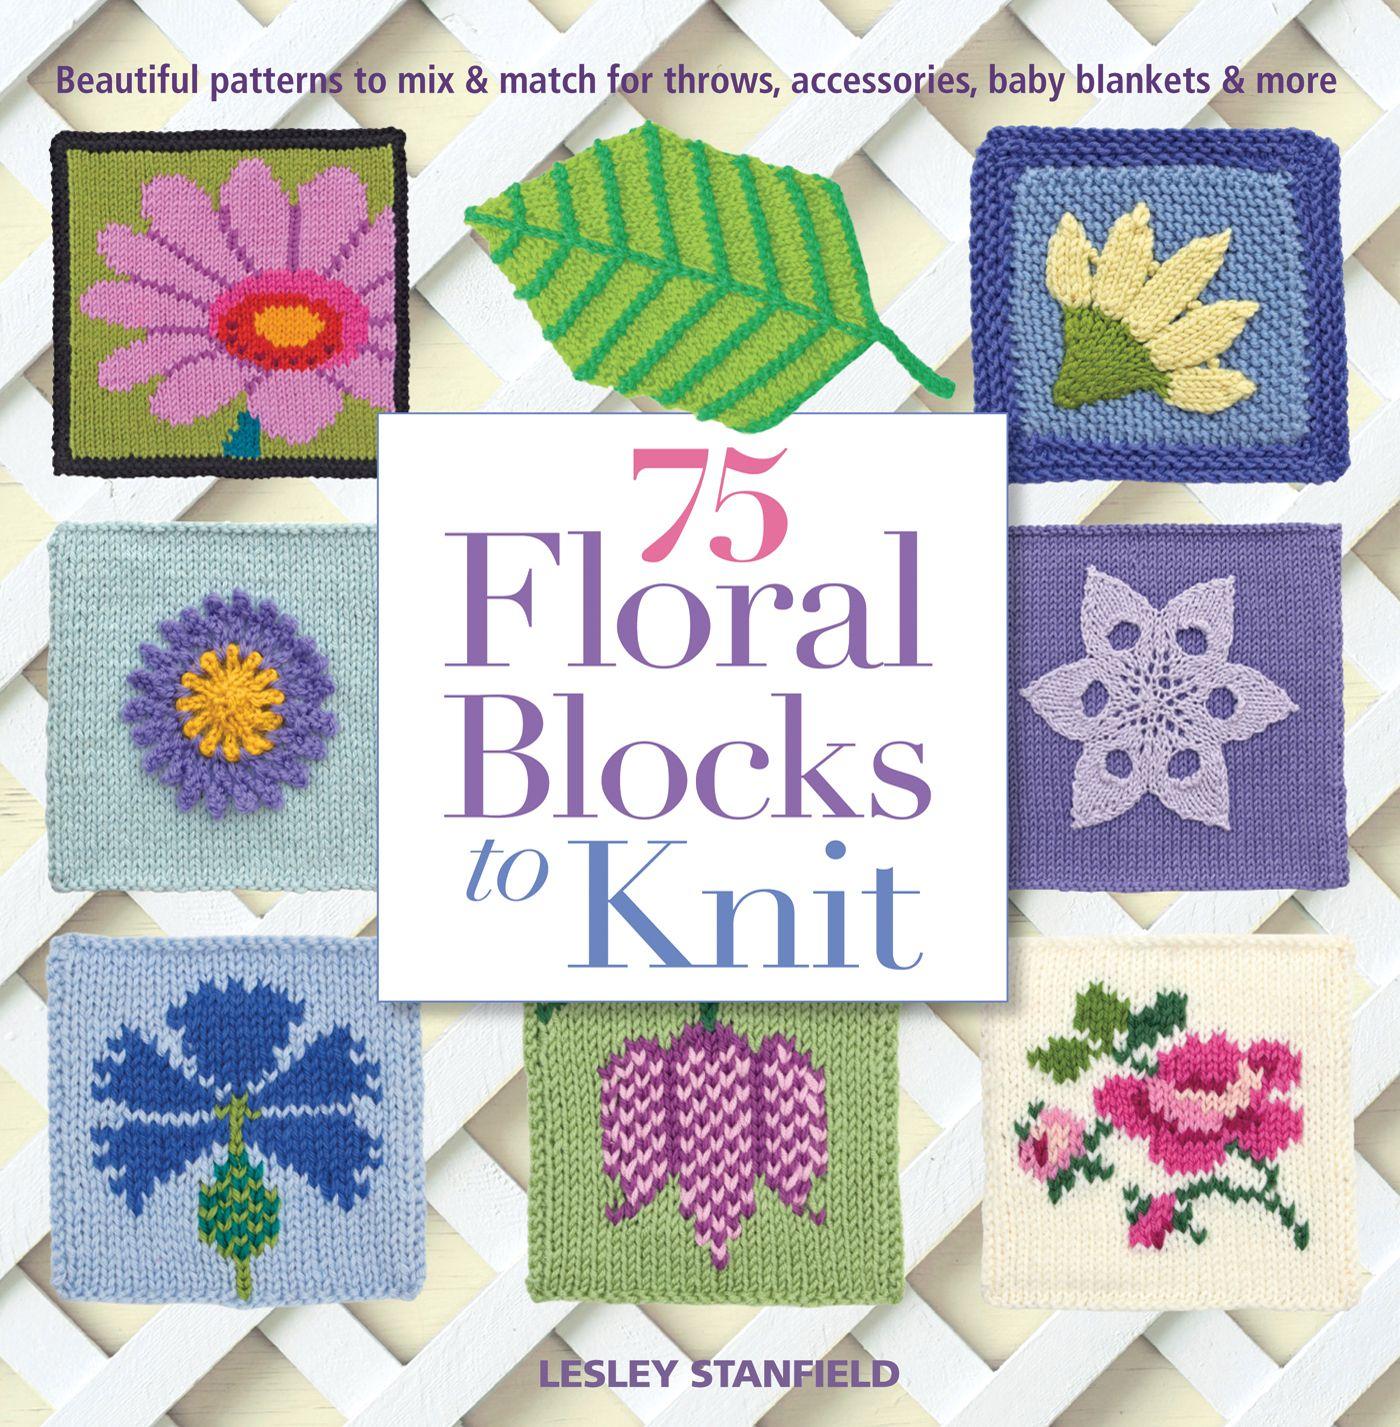 Pin de Hilda de Urrutia en Crochet 29a libros de puntos | Pinterest ...